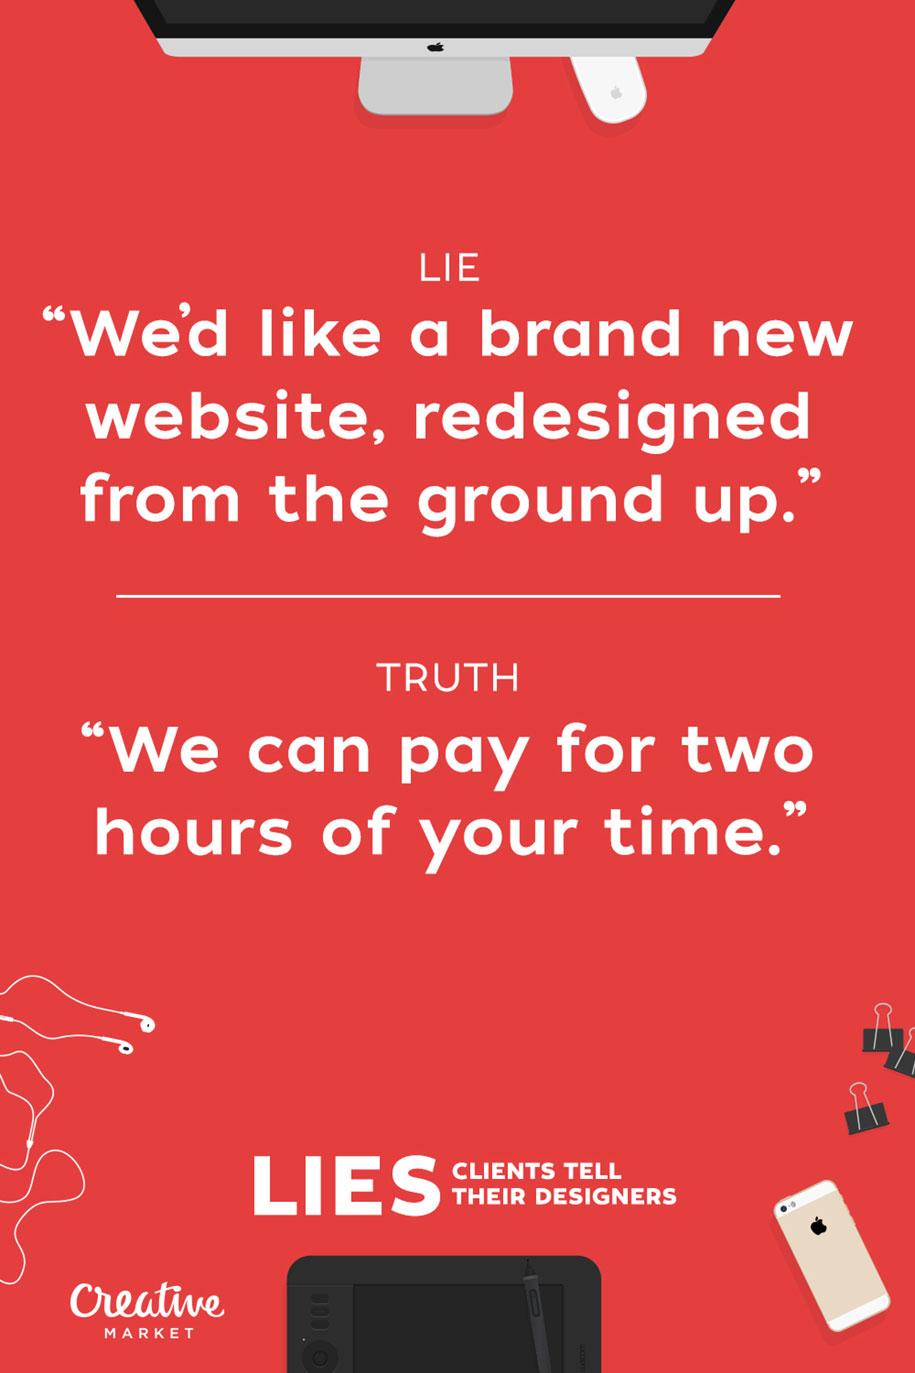 15-lies-clients-tell-designers-joshua-johnson-creative-market-12